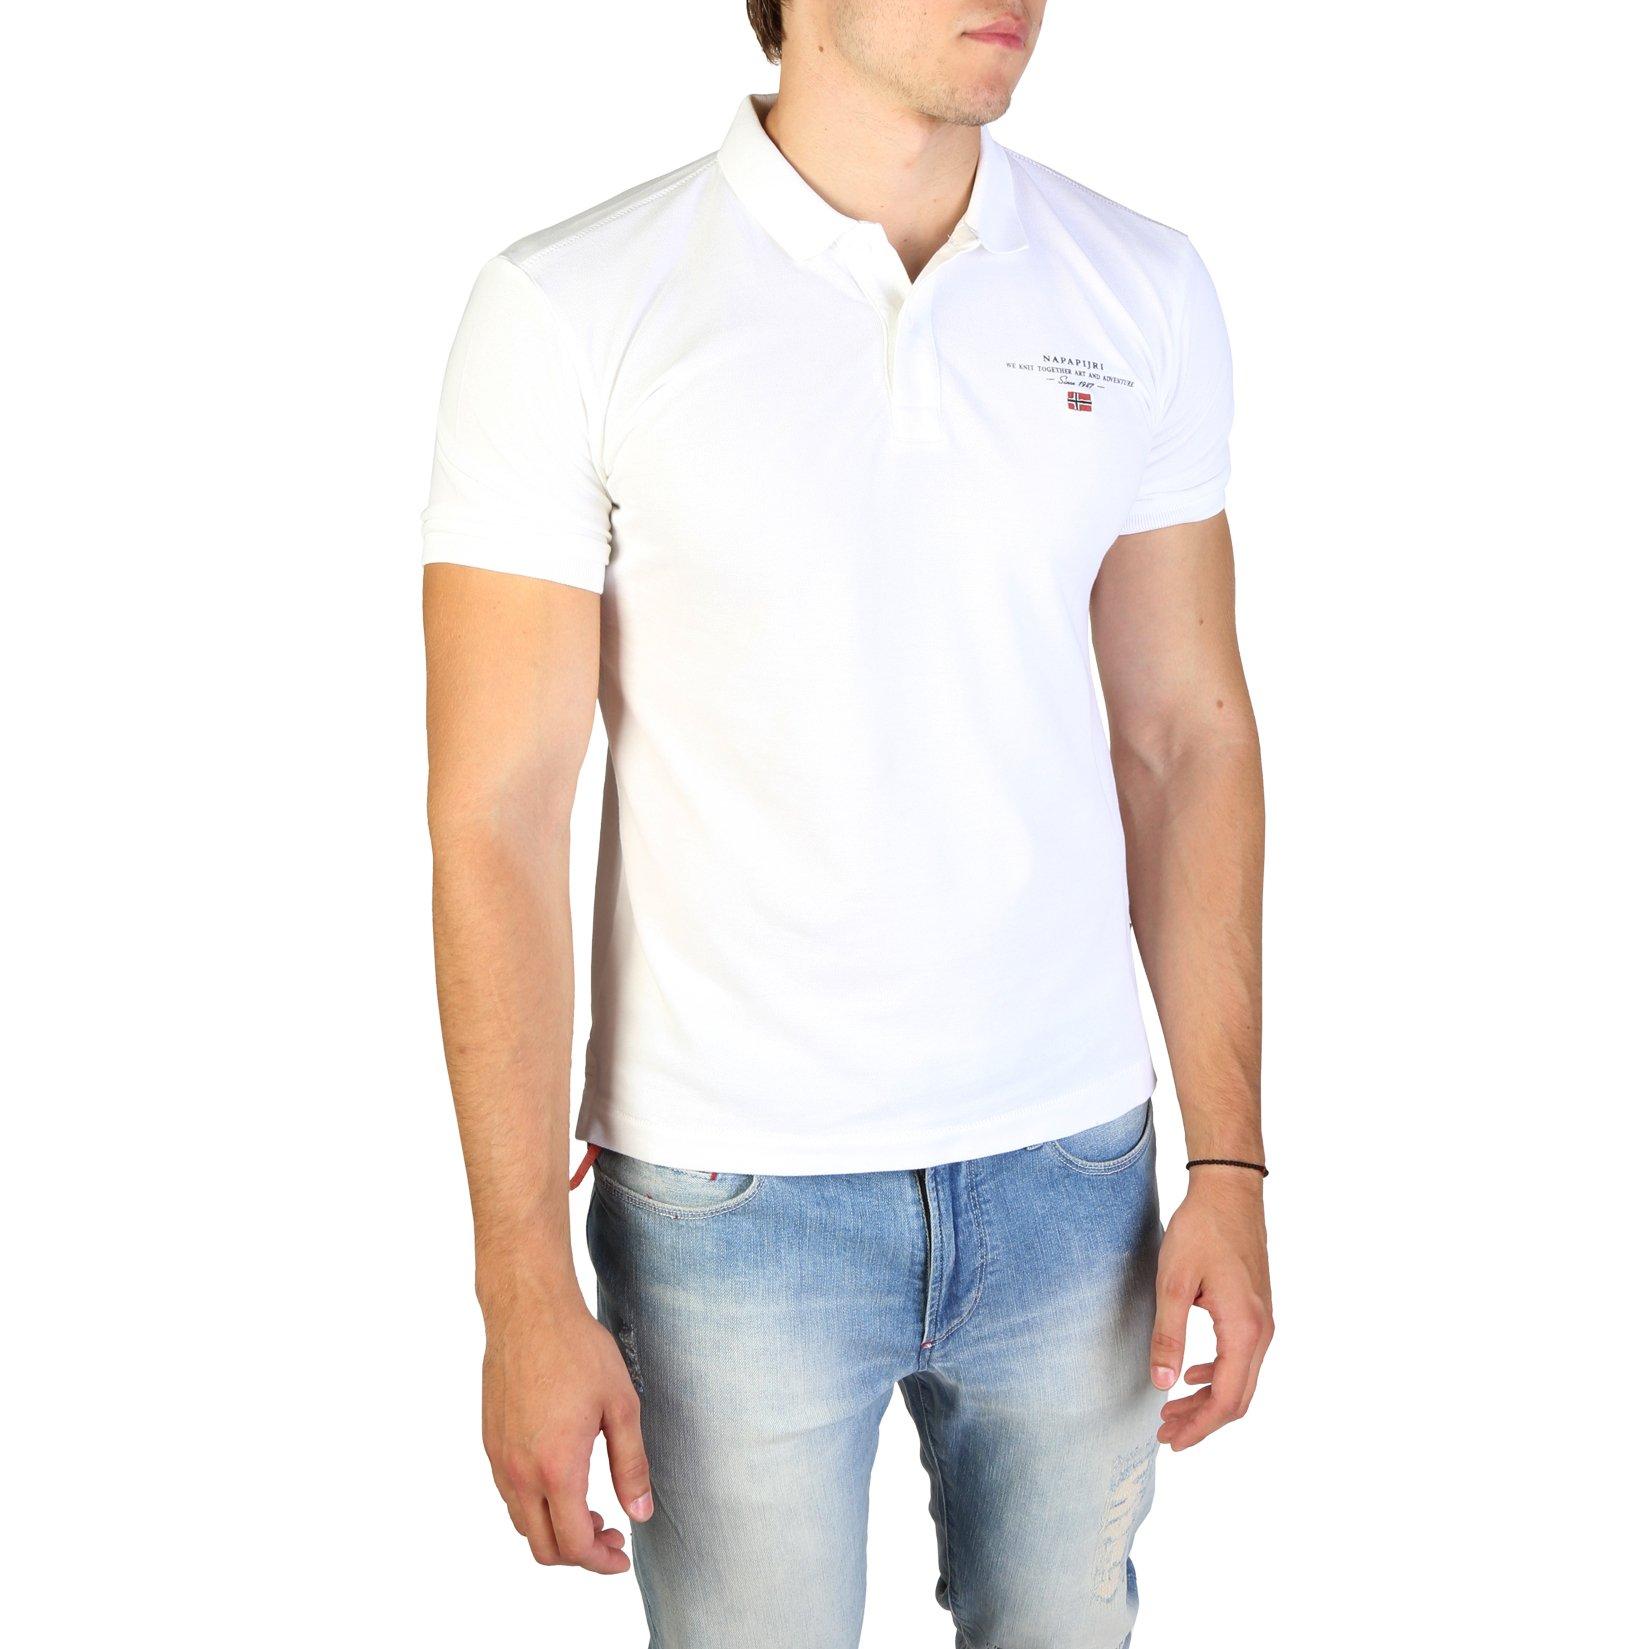 Napapijri Men's Polo Shirt Various Colours ELBAS3_NP0A4EGC - white S